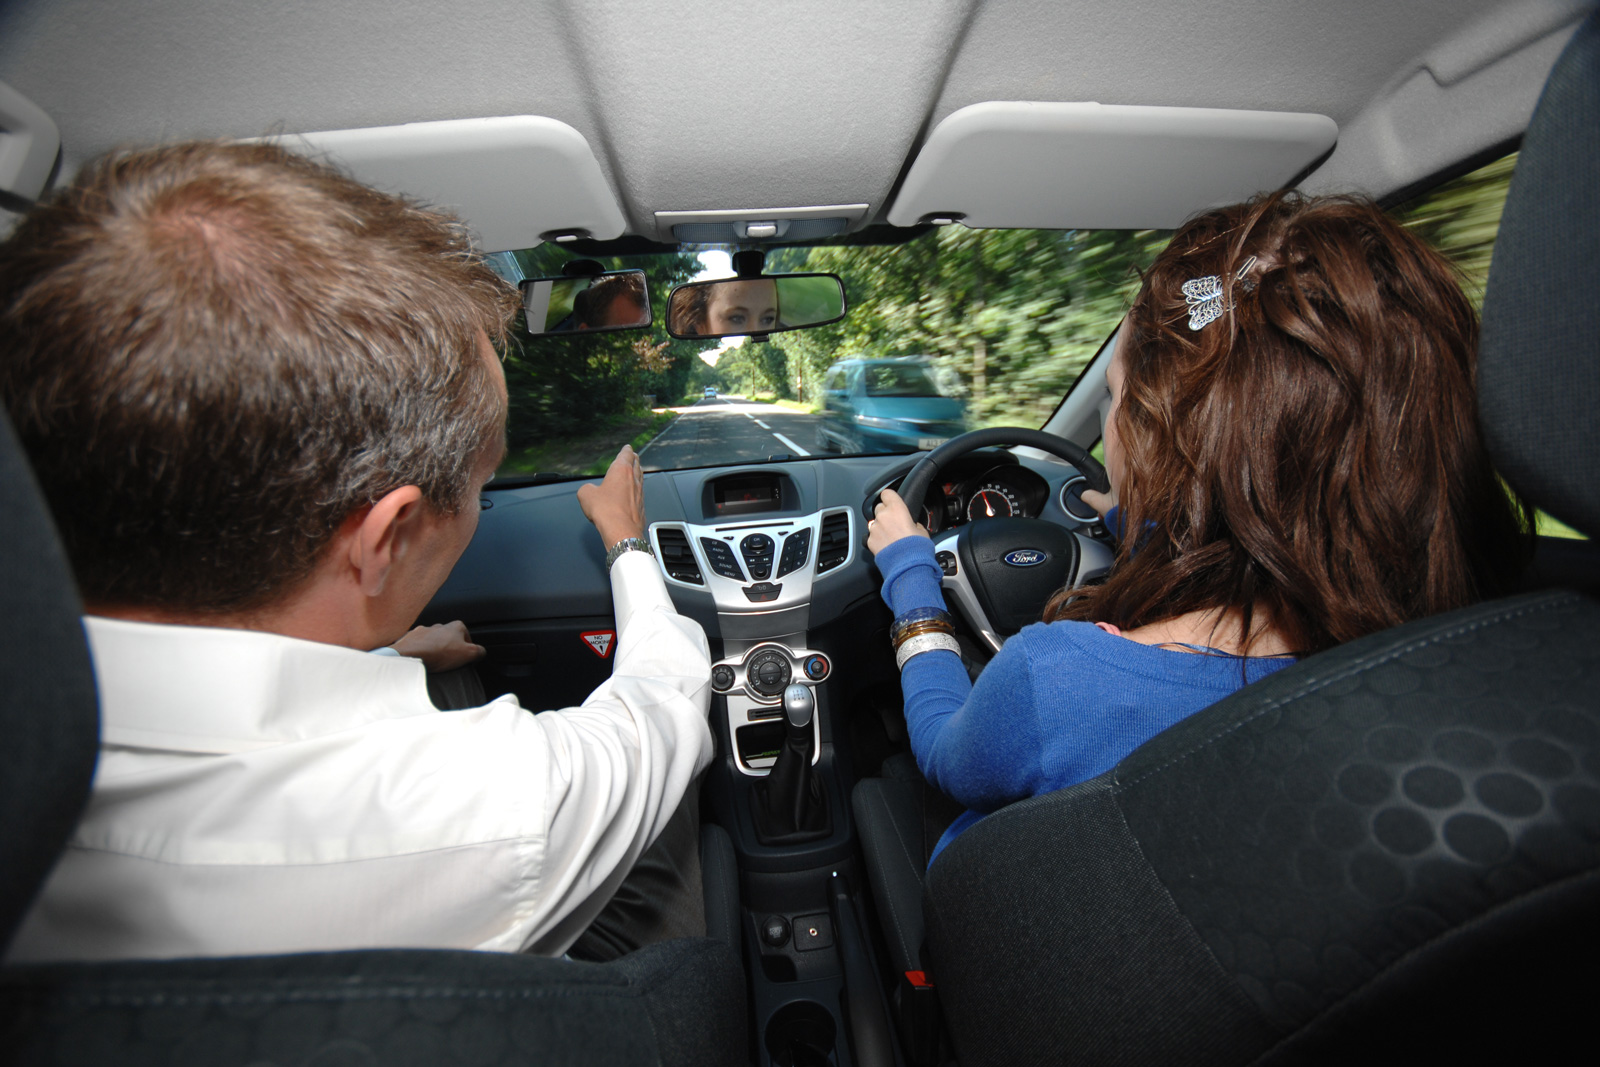 (c) Drivingworks.co.uk